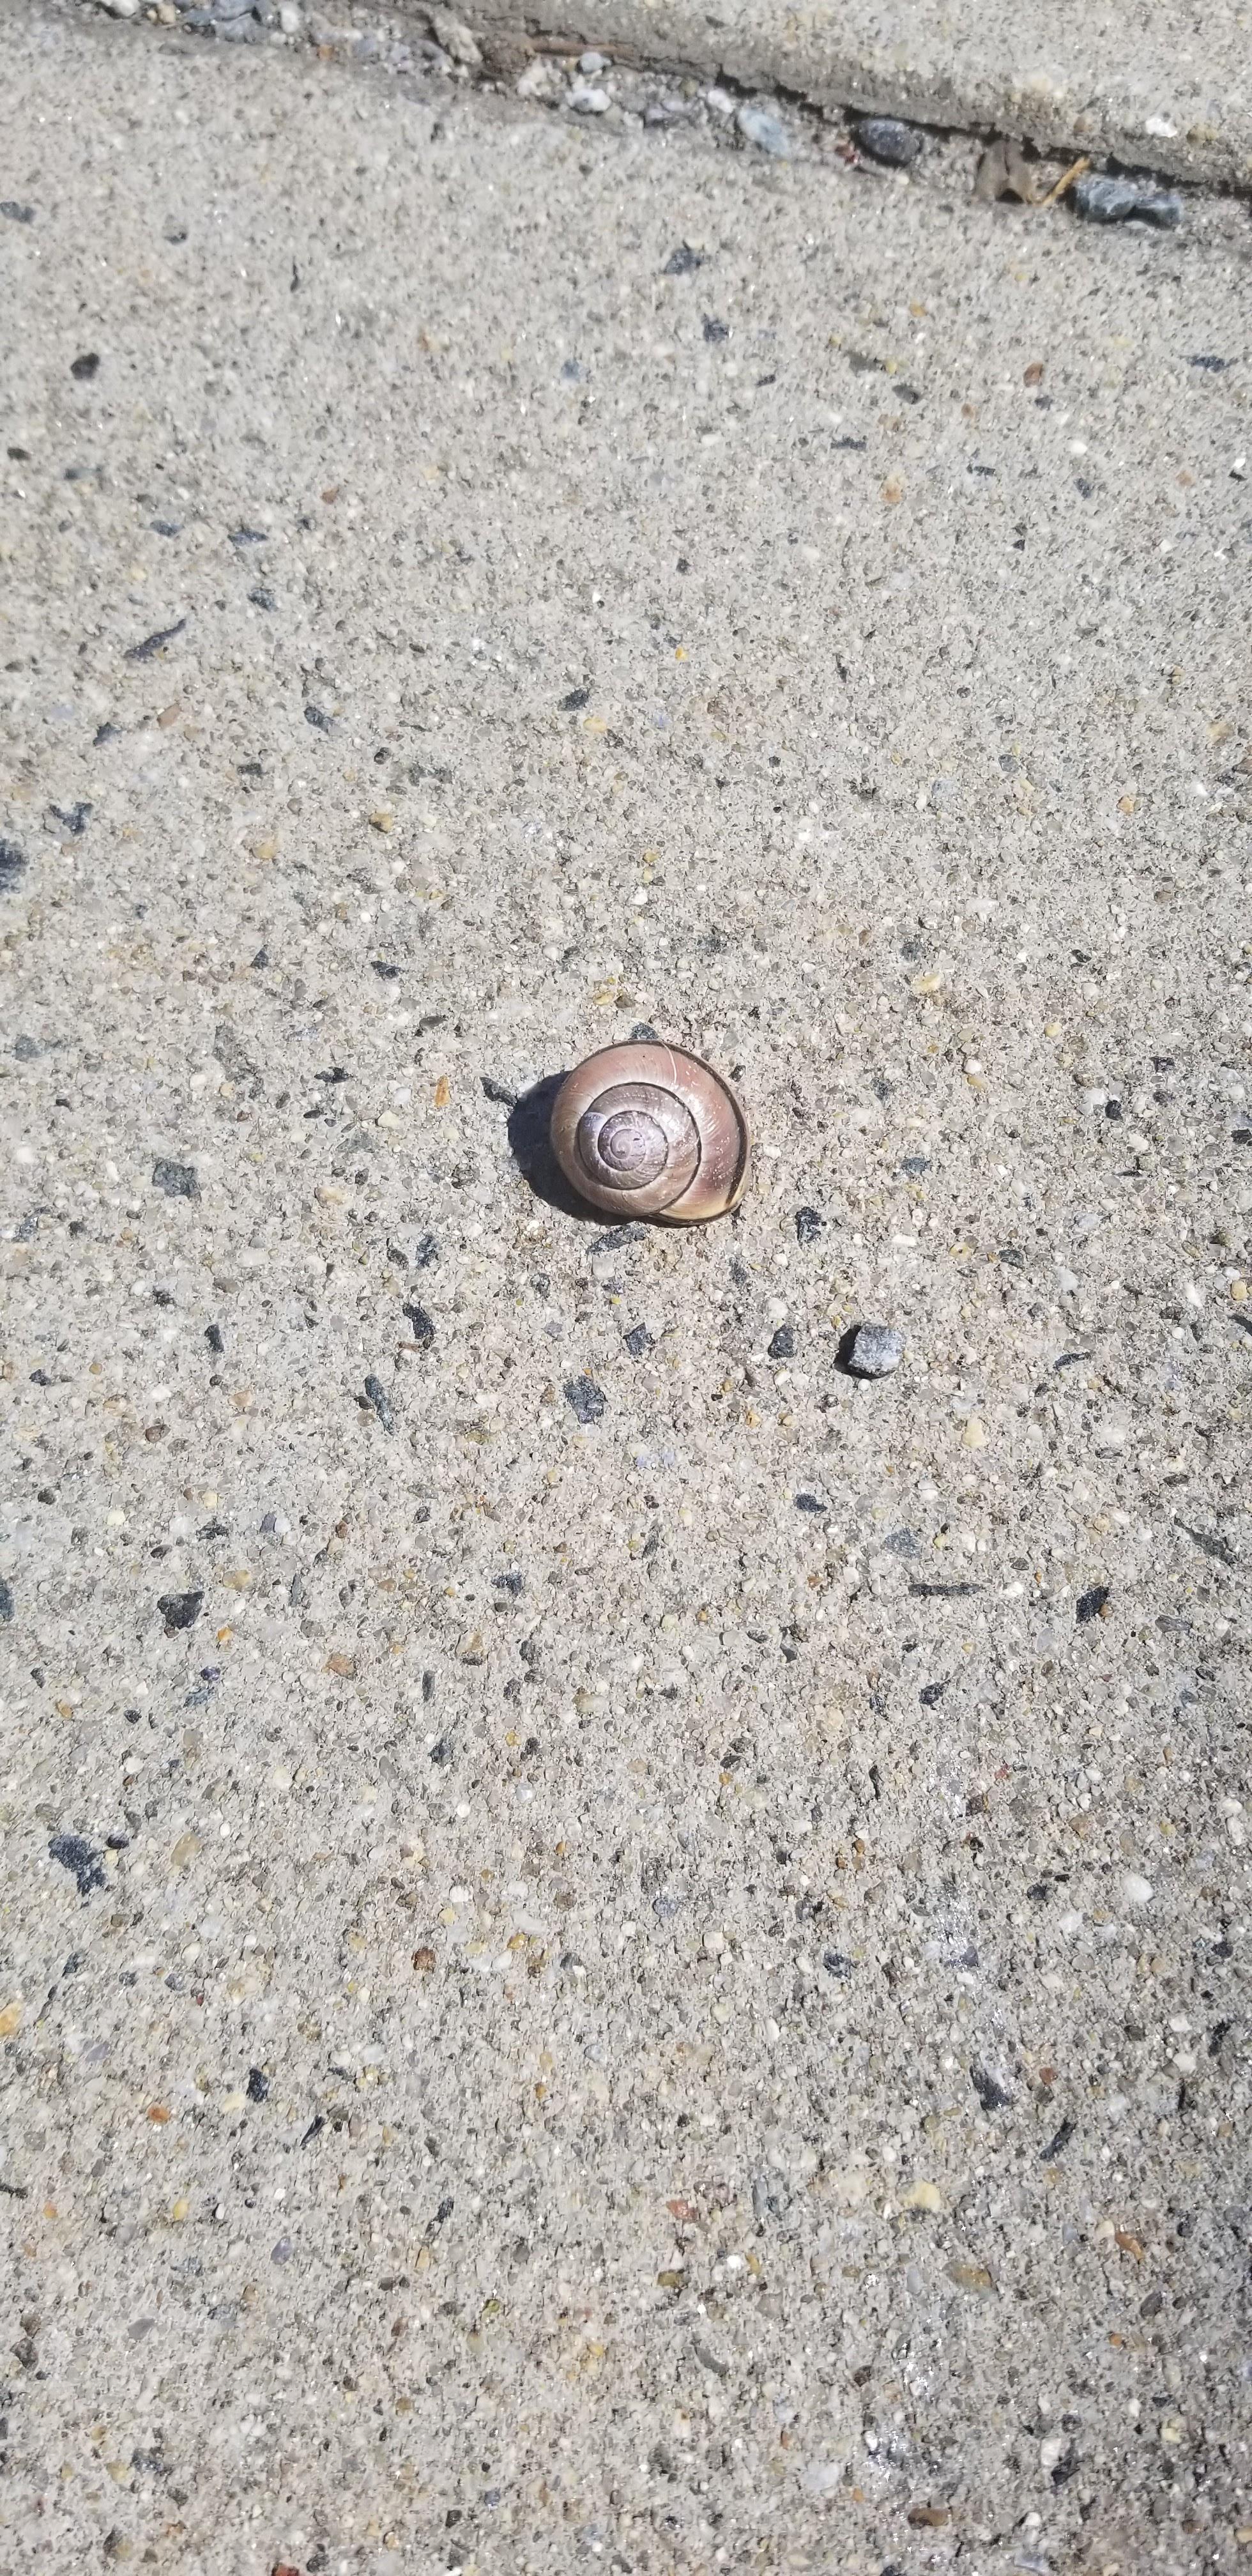 Snail sidewalk